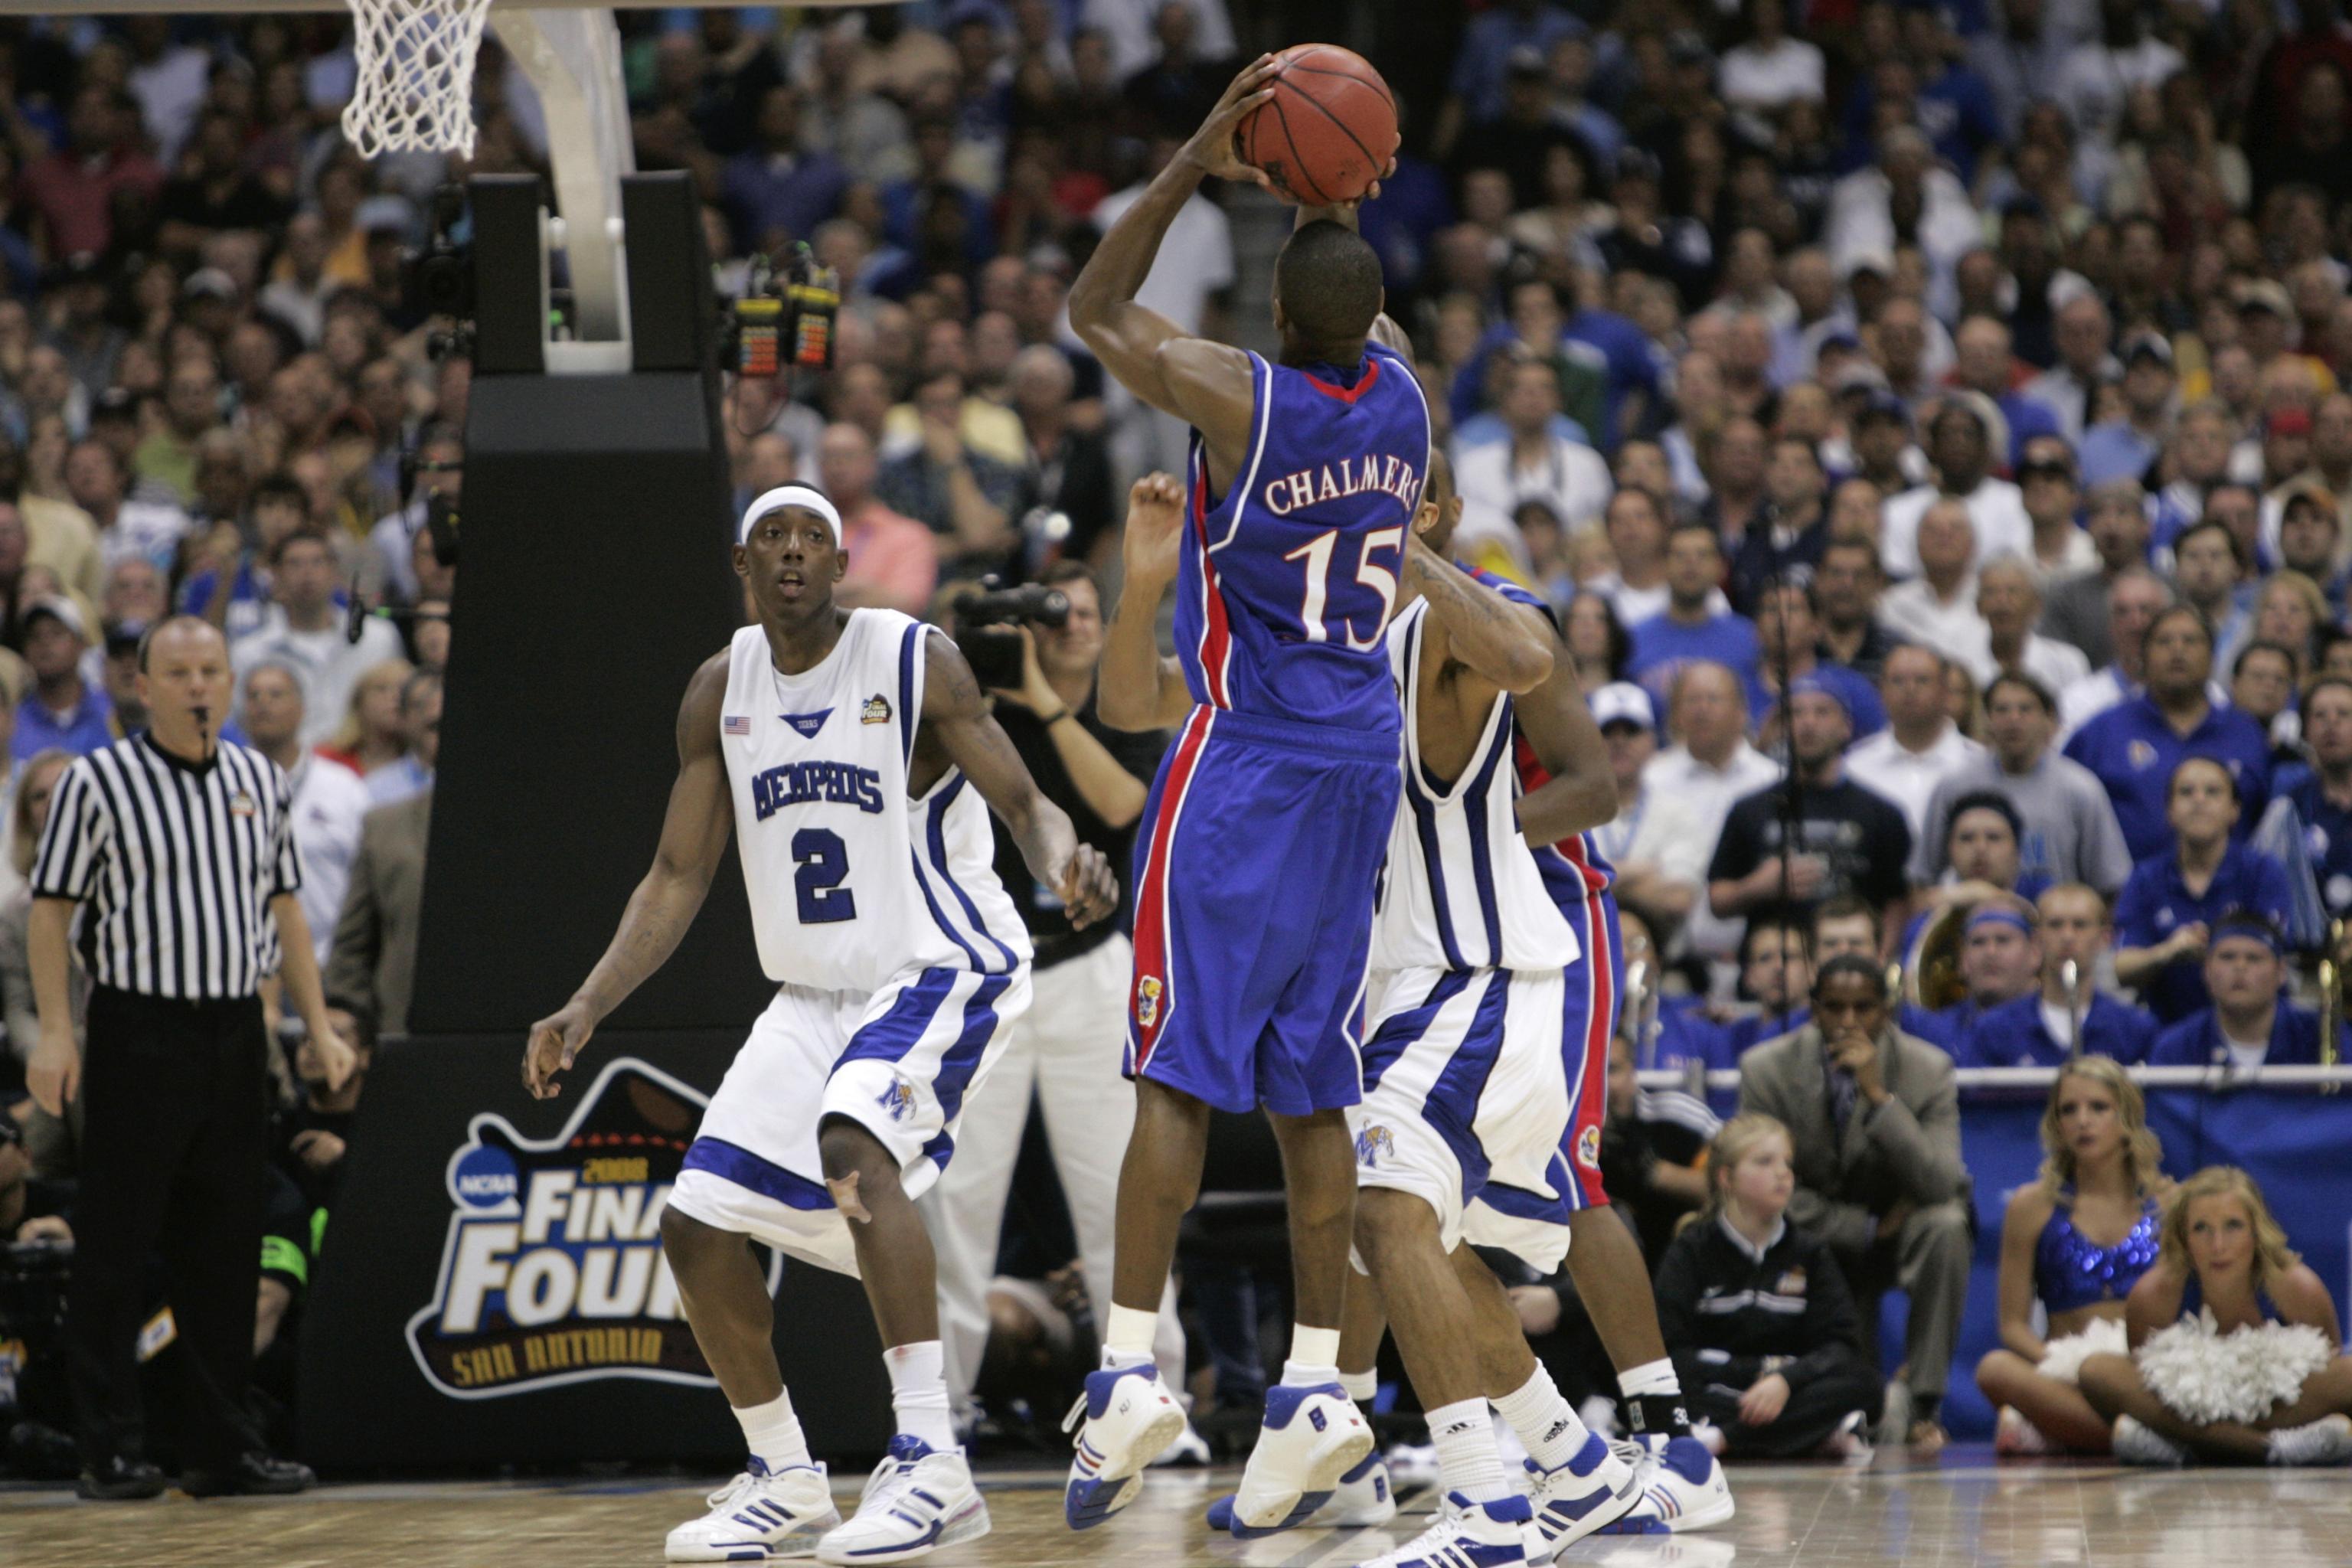 Kansas Head Coach Bill Self Live-Tweets 2008 National Championship ...